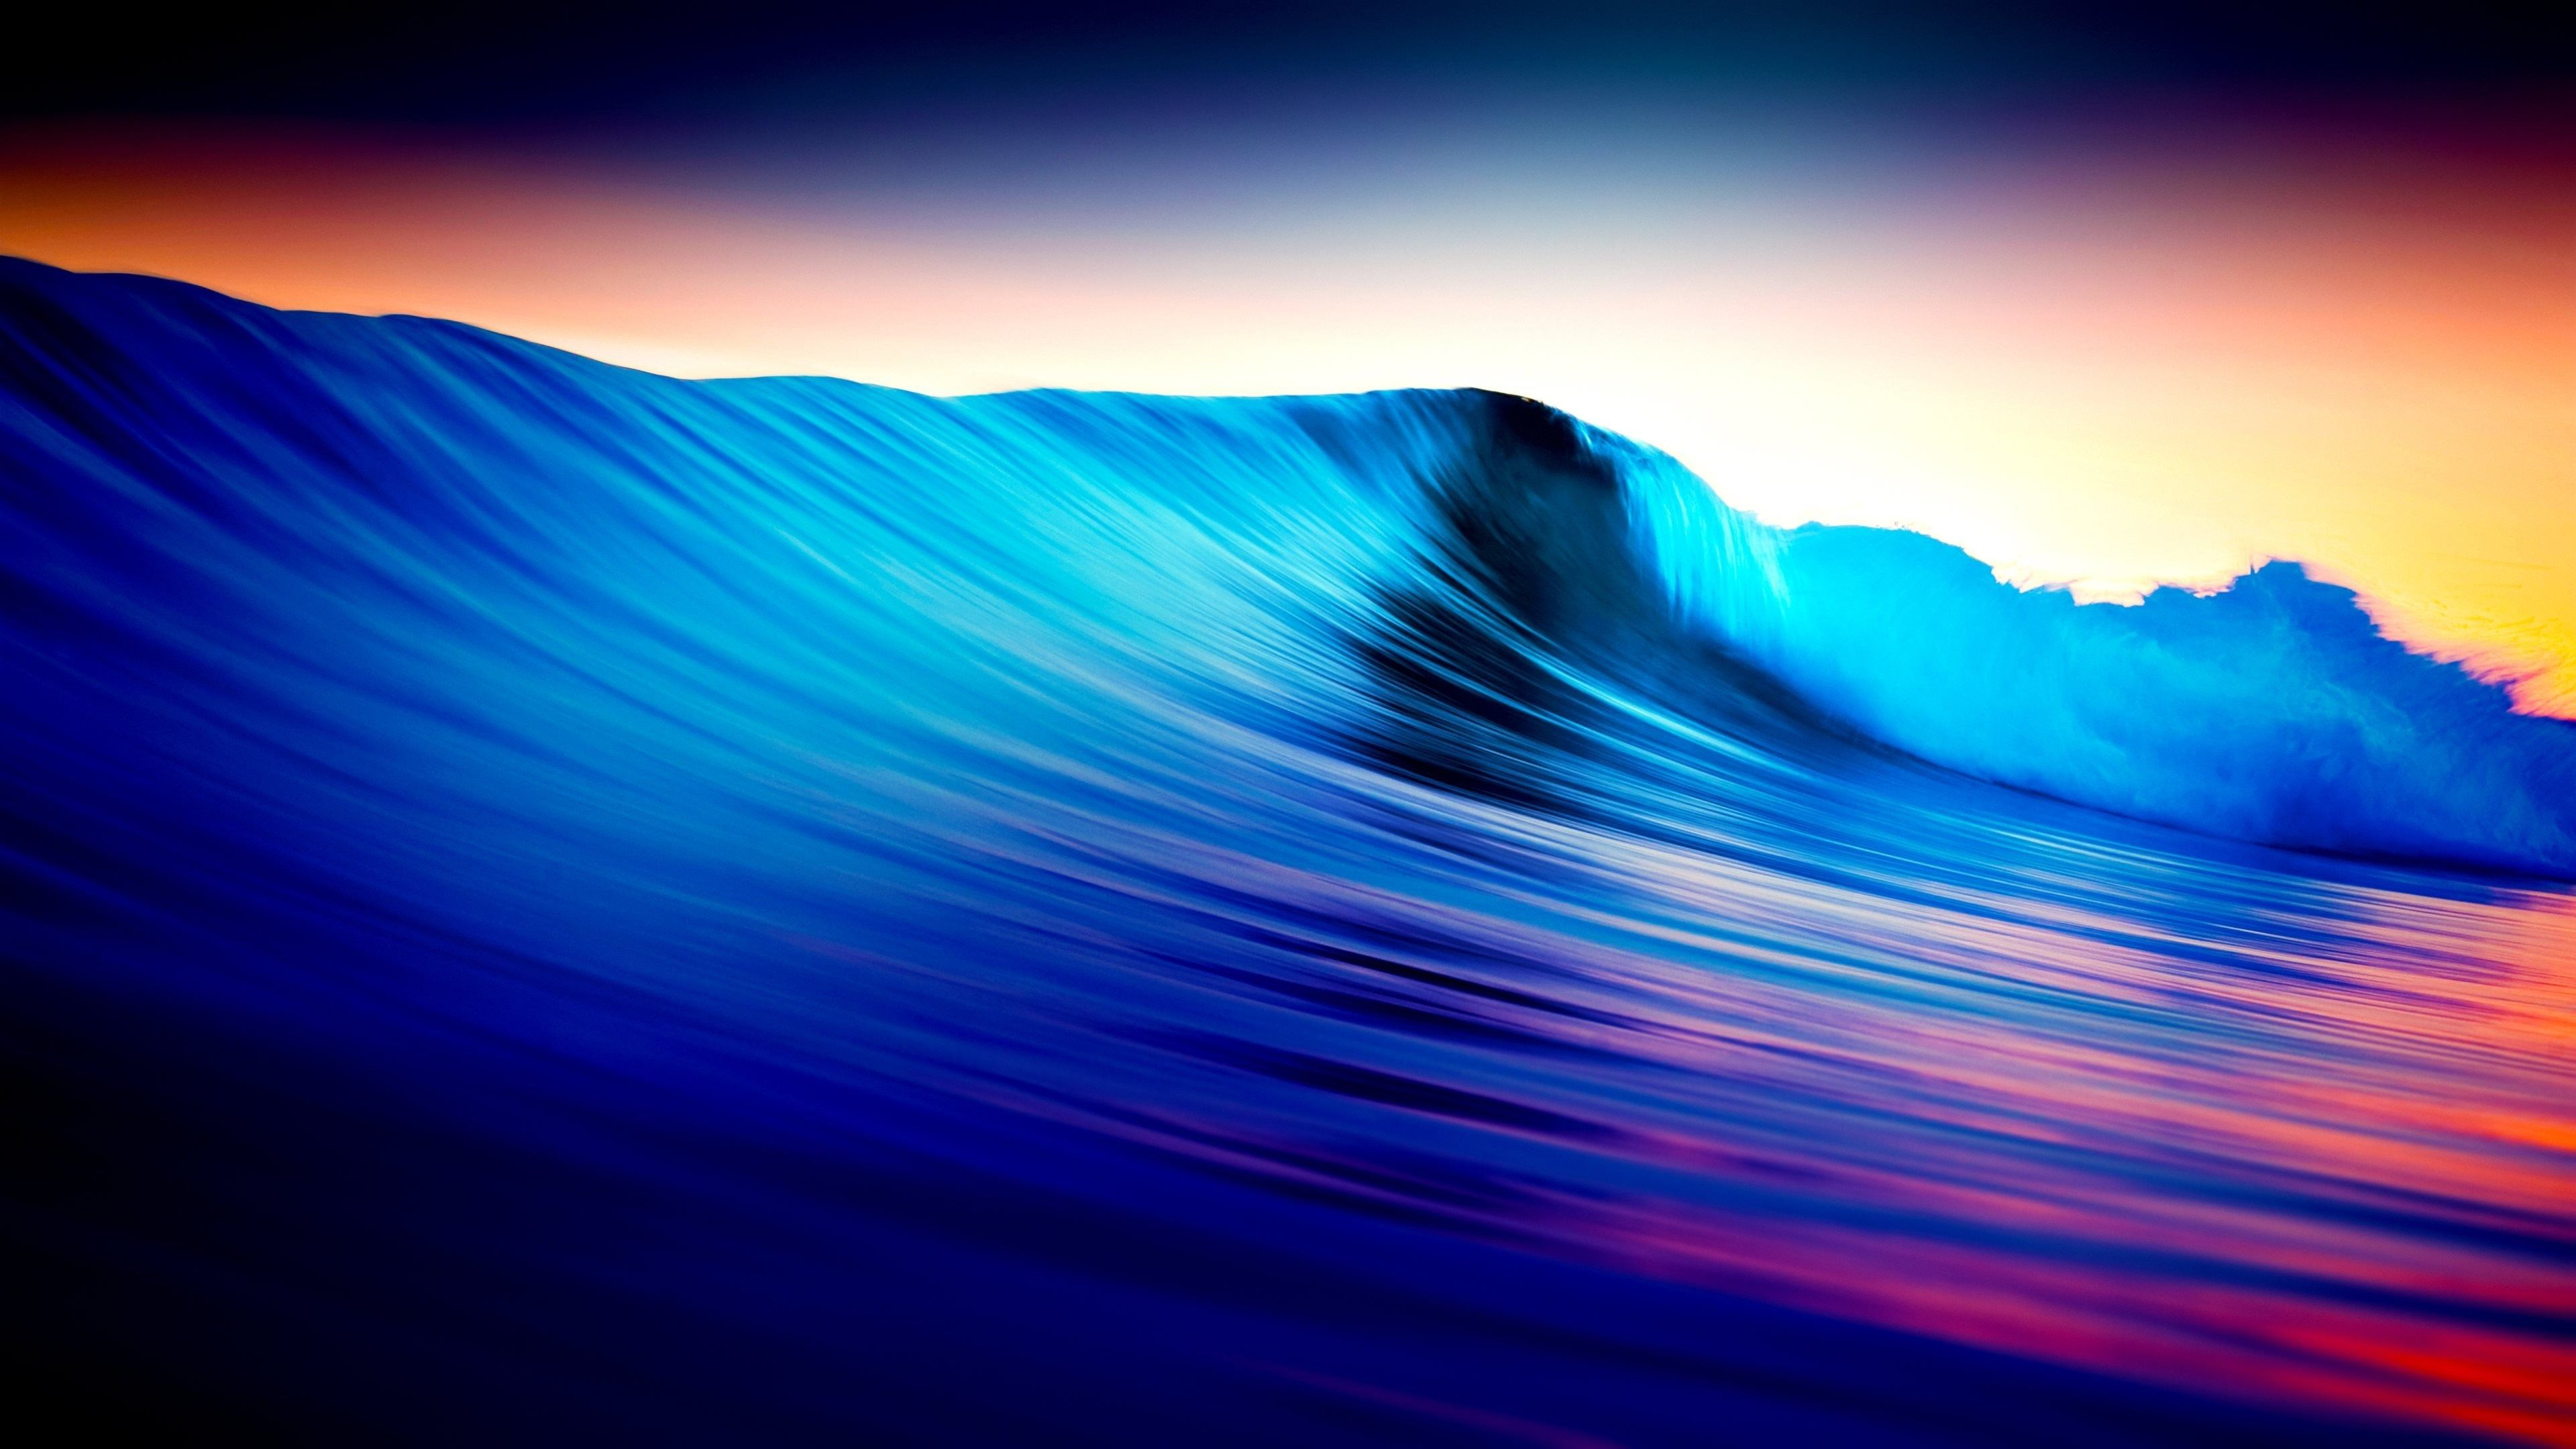 Beautiful Wallpaper High Resolution Wave - d5725f6e8f52dbd80e636af5c2ef28e0  Snapshot_365379.jpg